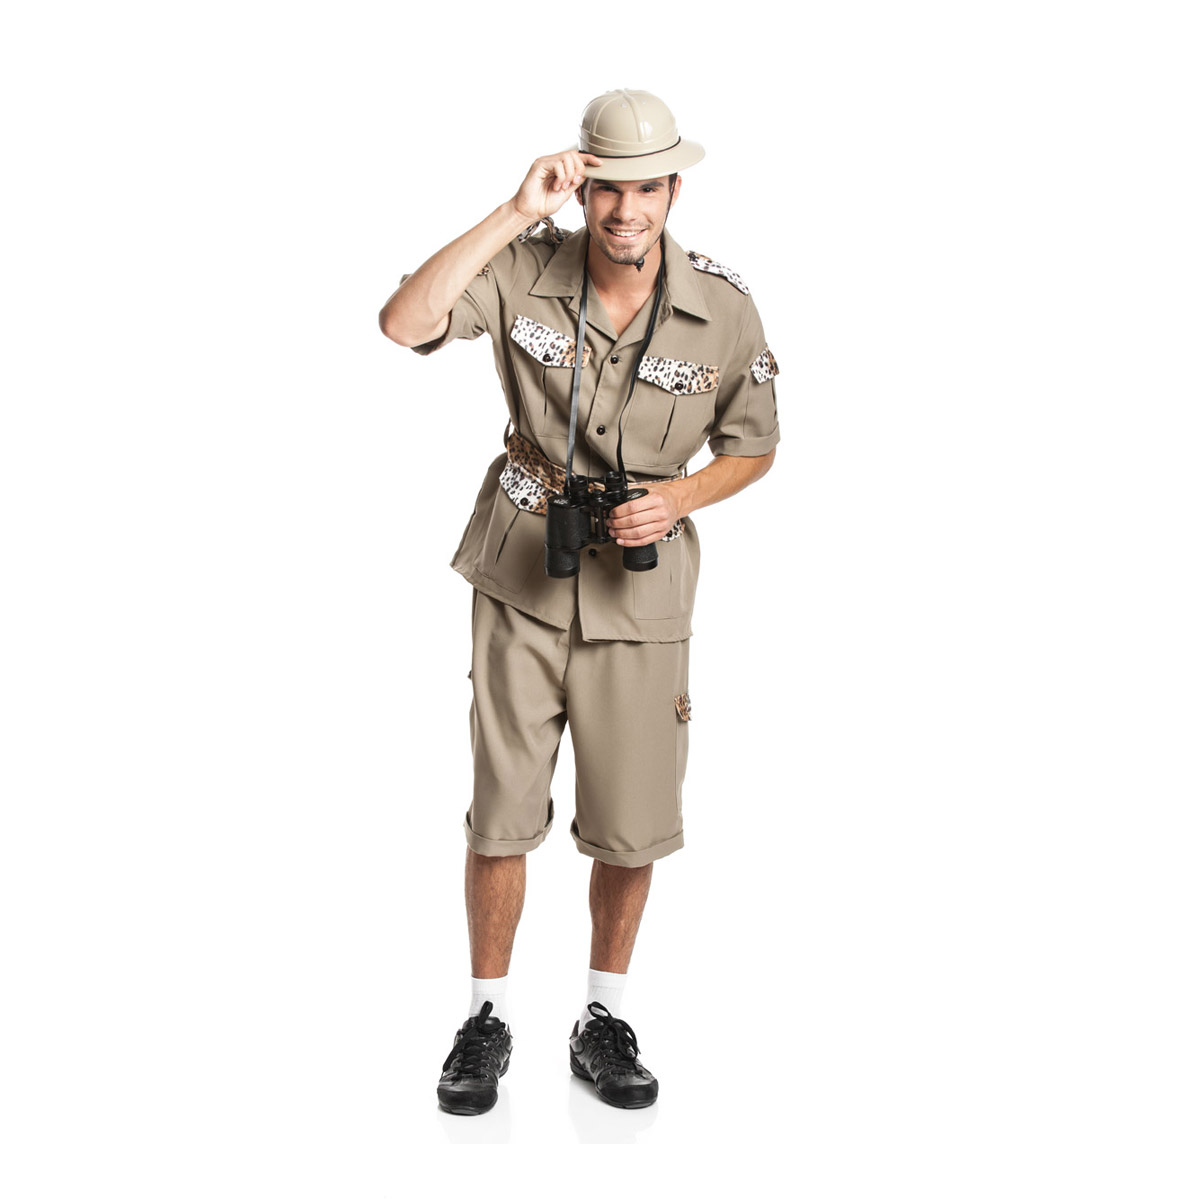 safari kost m herren dschungel uniform entdecker kost mplanet. Black Bedroom Furniture Sets. Home Design Ideas